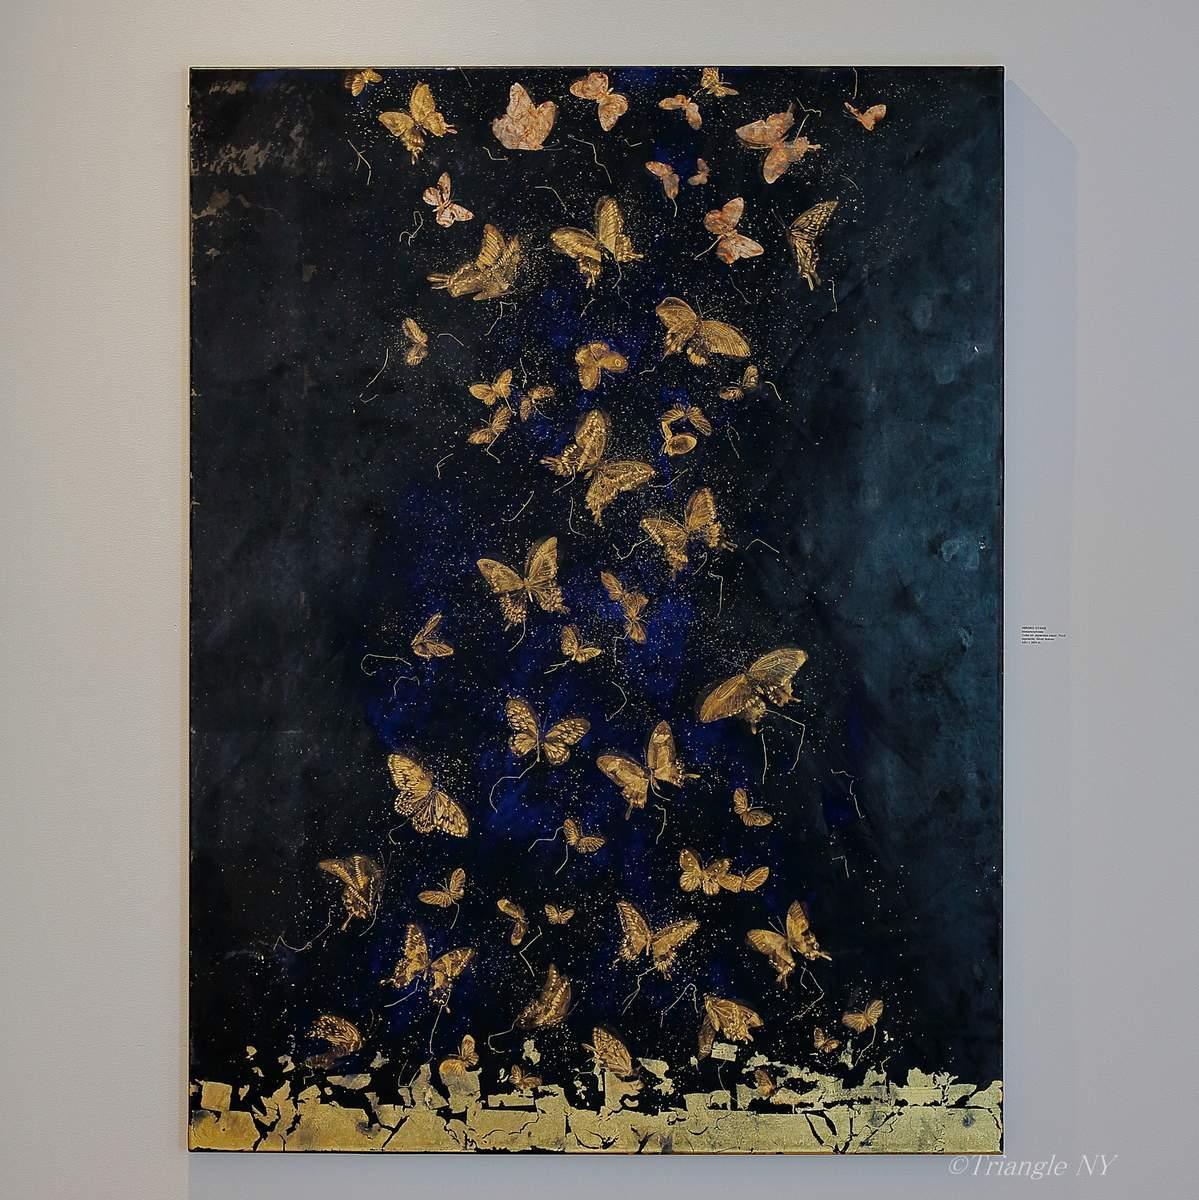 大竹寛子 Exhibition @ Waterfall Gallery New York 2017_a0274805_23261258.jpg